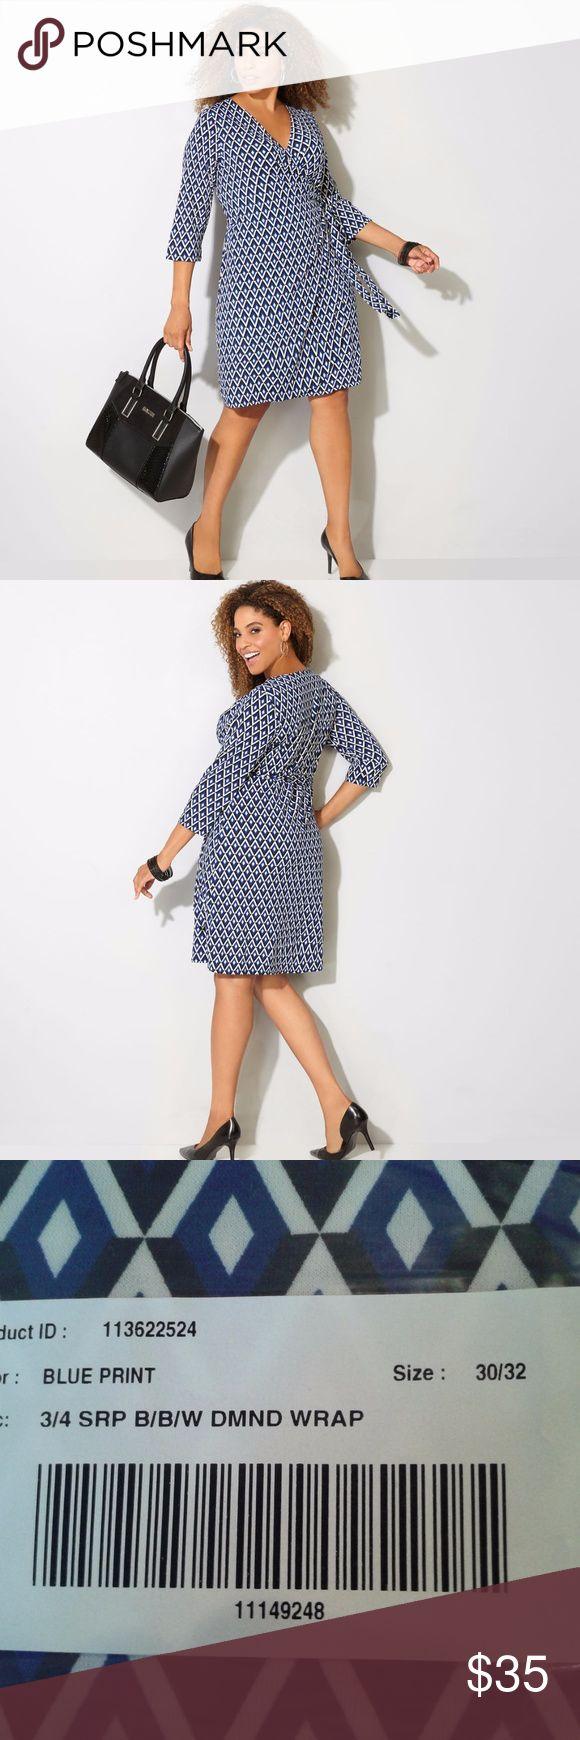 Wal g wrap detail dress with metallic stripe in blue navy lyst - Avenue Diamond Geo Wrap Dress Sz 30 32 New Boutique